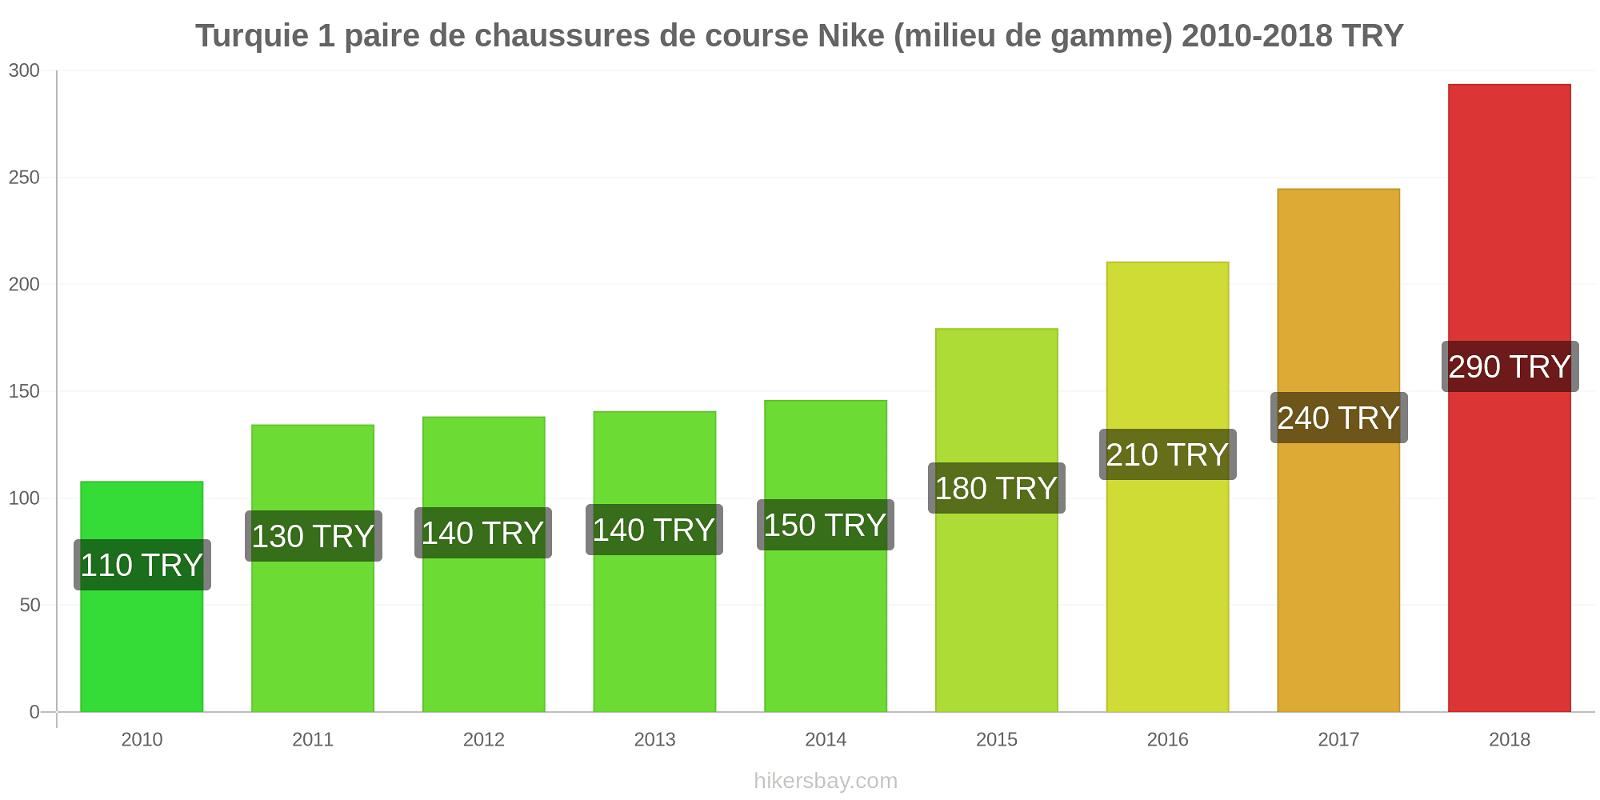 Turquie changements de prix 1 paire de chaussures de course Nike (milieu de gamme) hikersbay.com